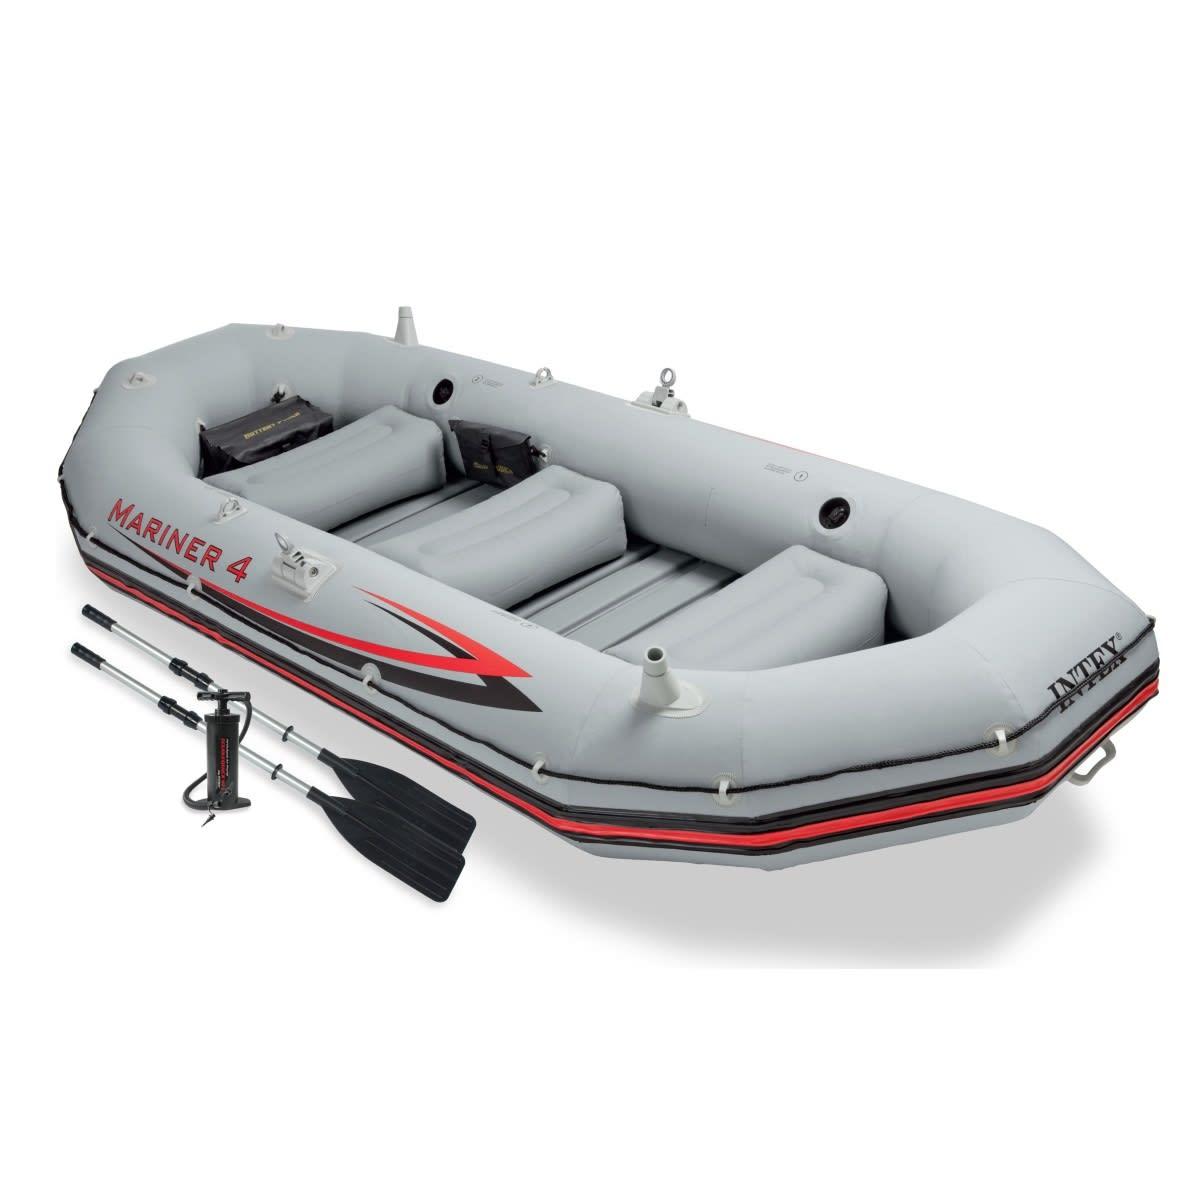 Intex 'Mariner 4 Boat Set